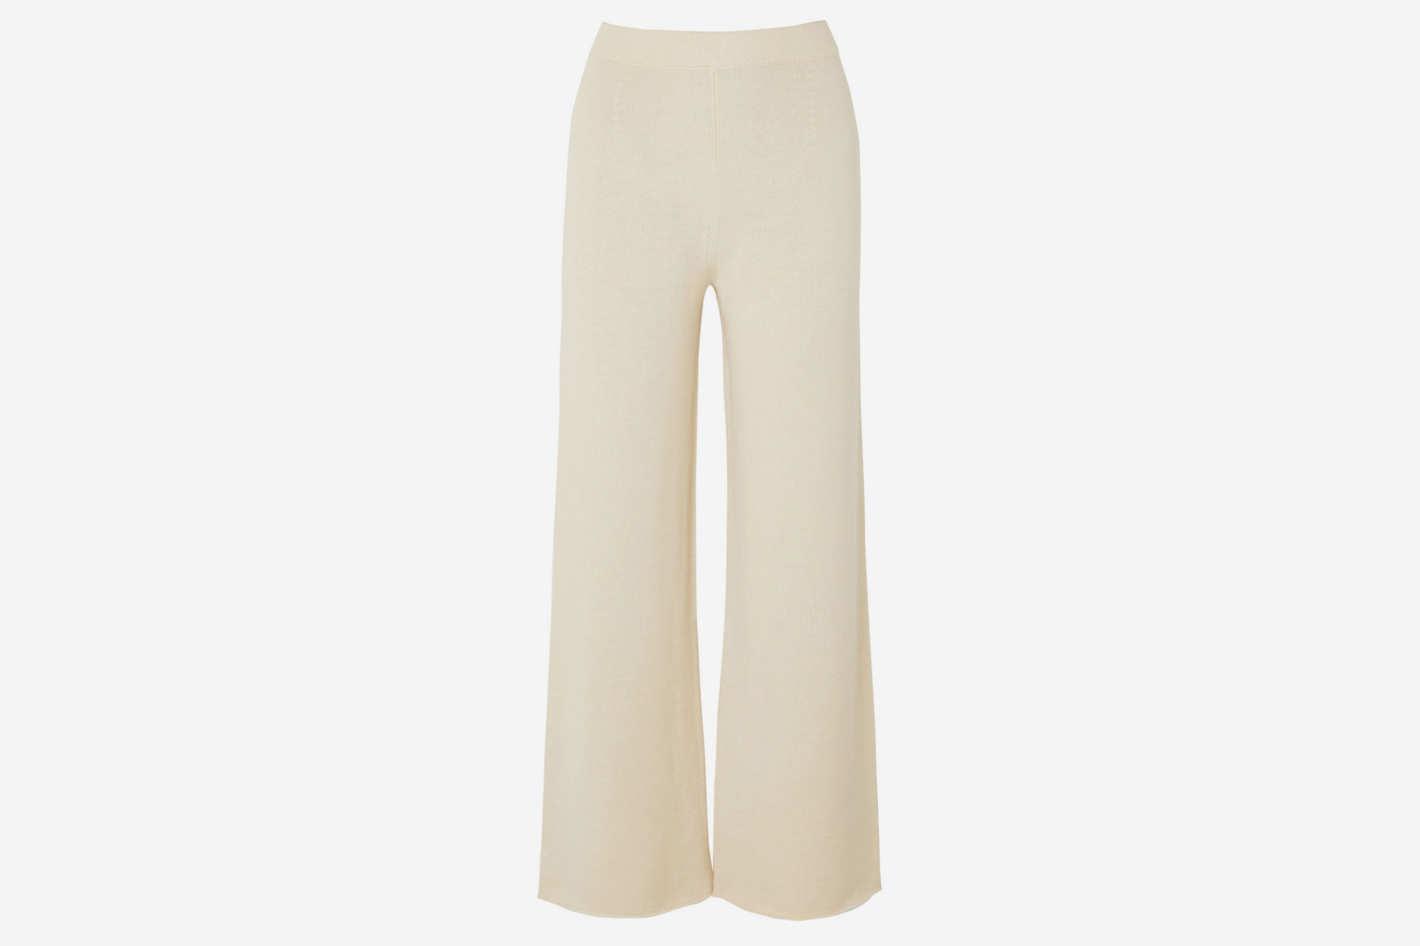 Mansur Gavriel Alpaca and Silk-Blend Pants